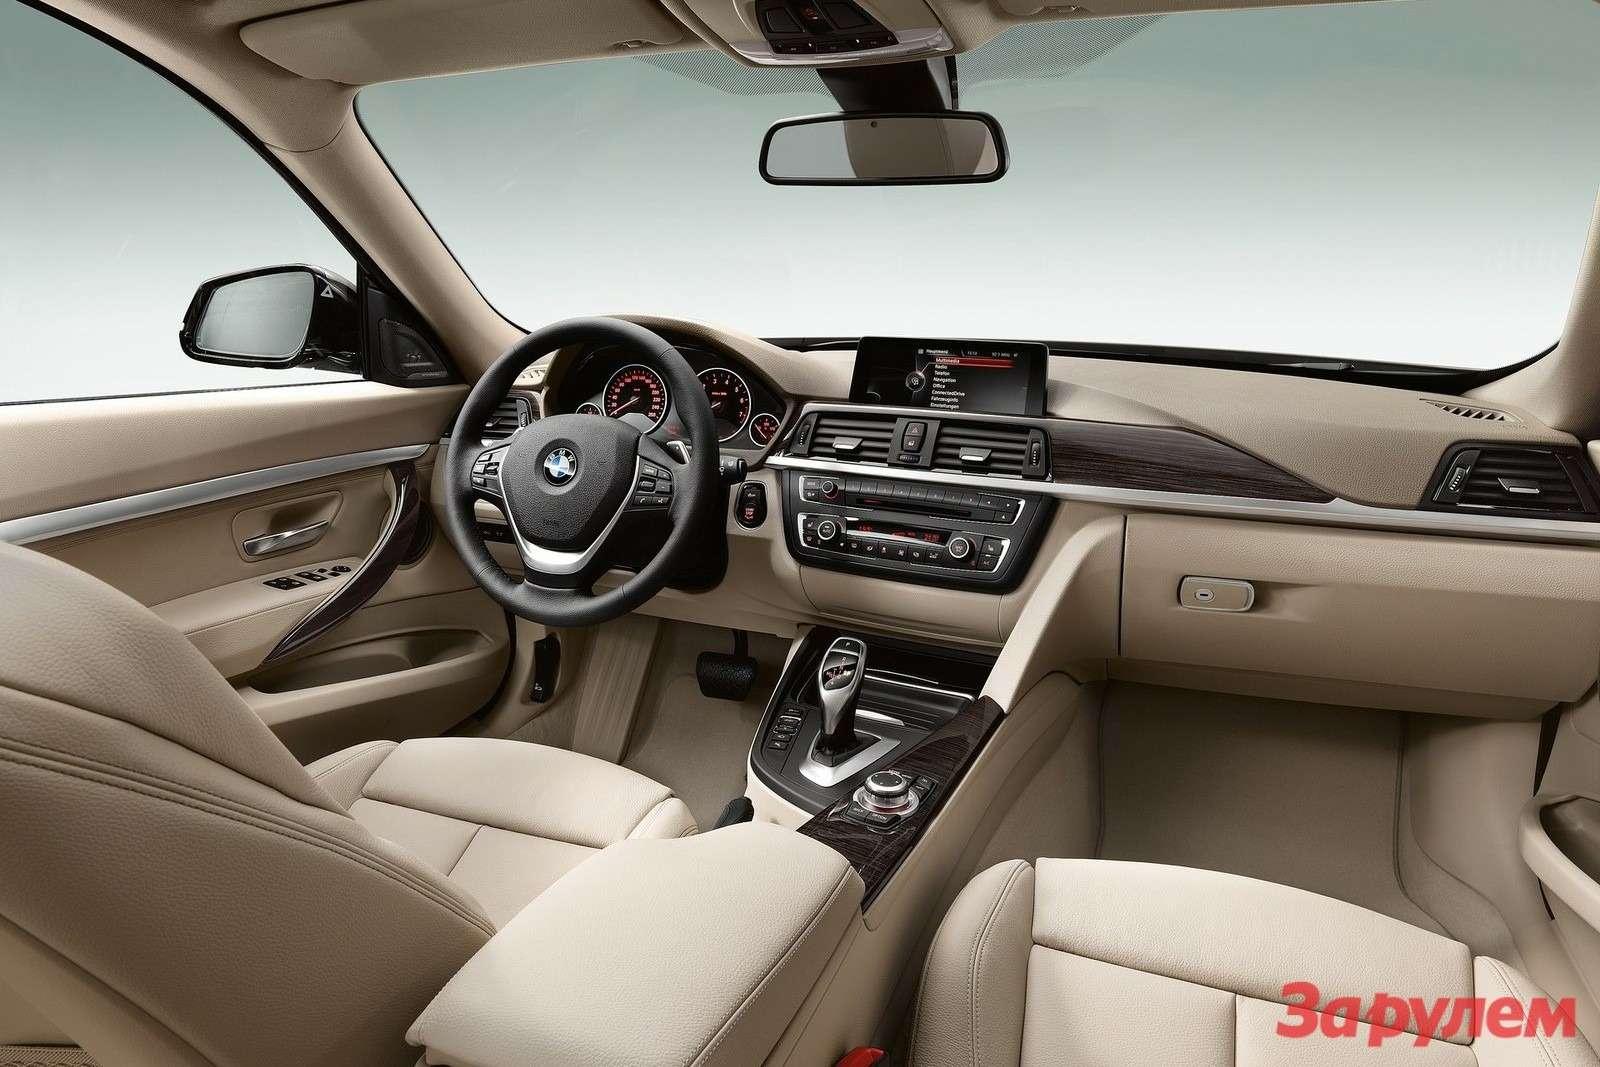 BMW-3-Series_Gran_Turismo_2014_1600x1200_wallpaper_58